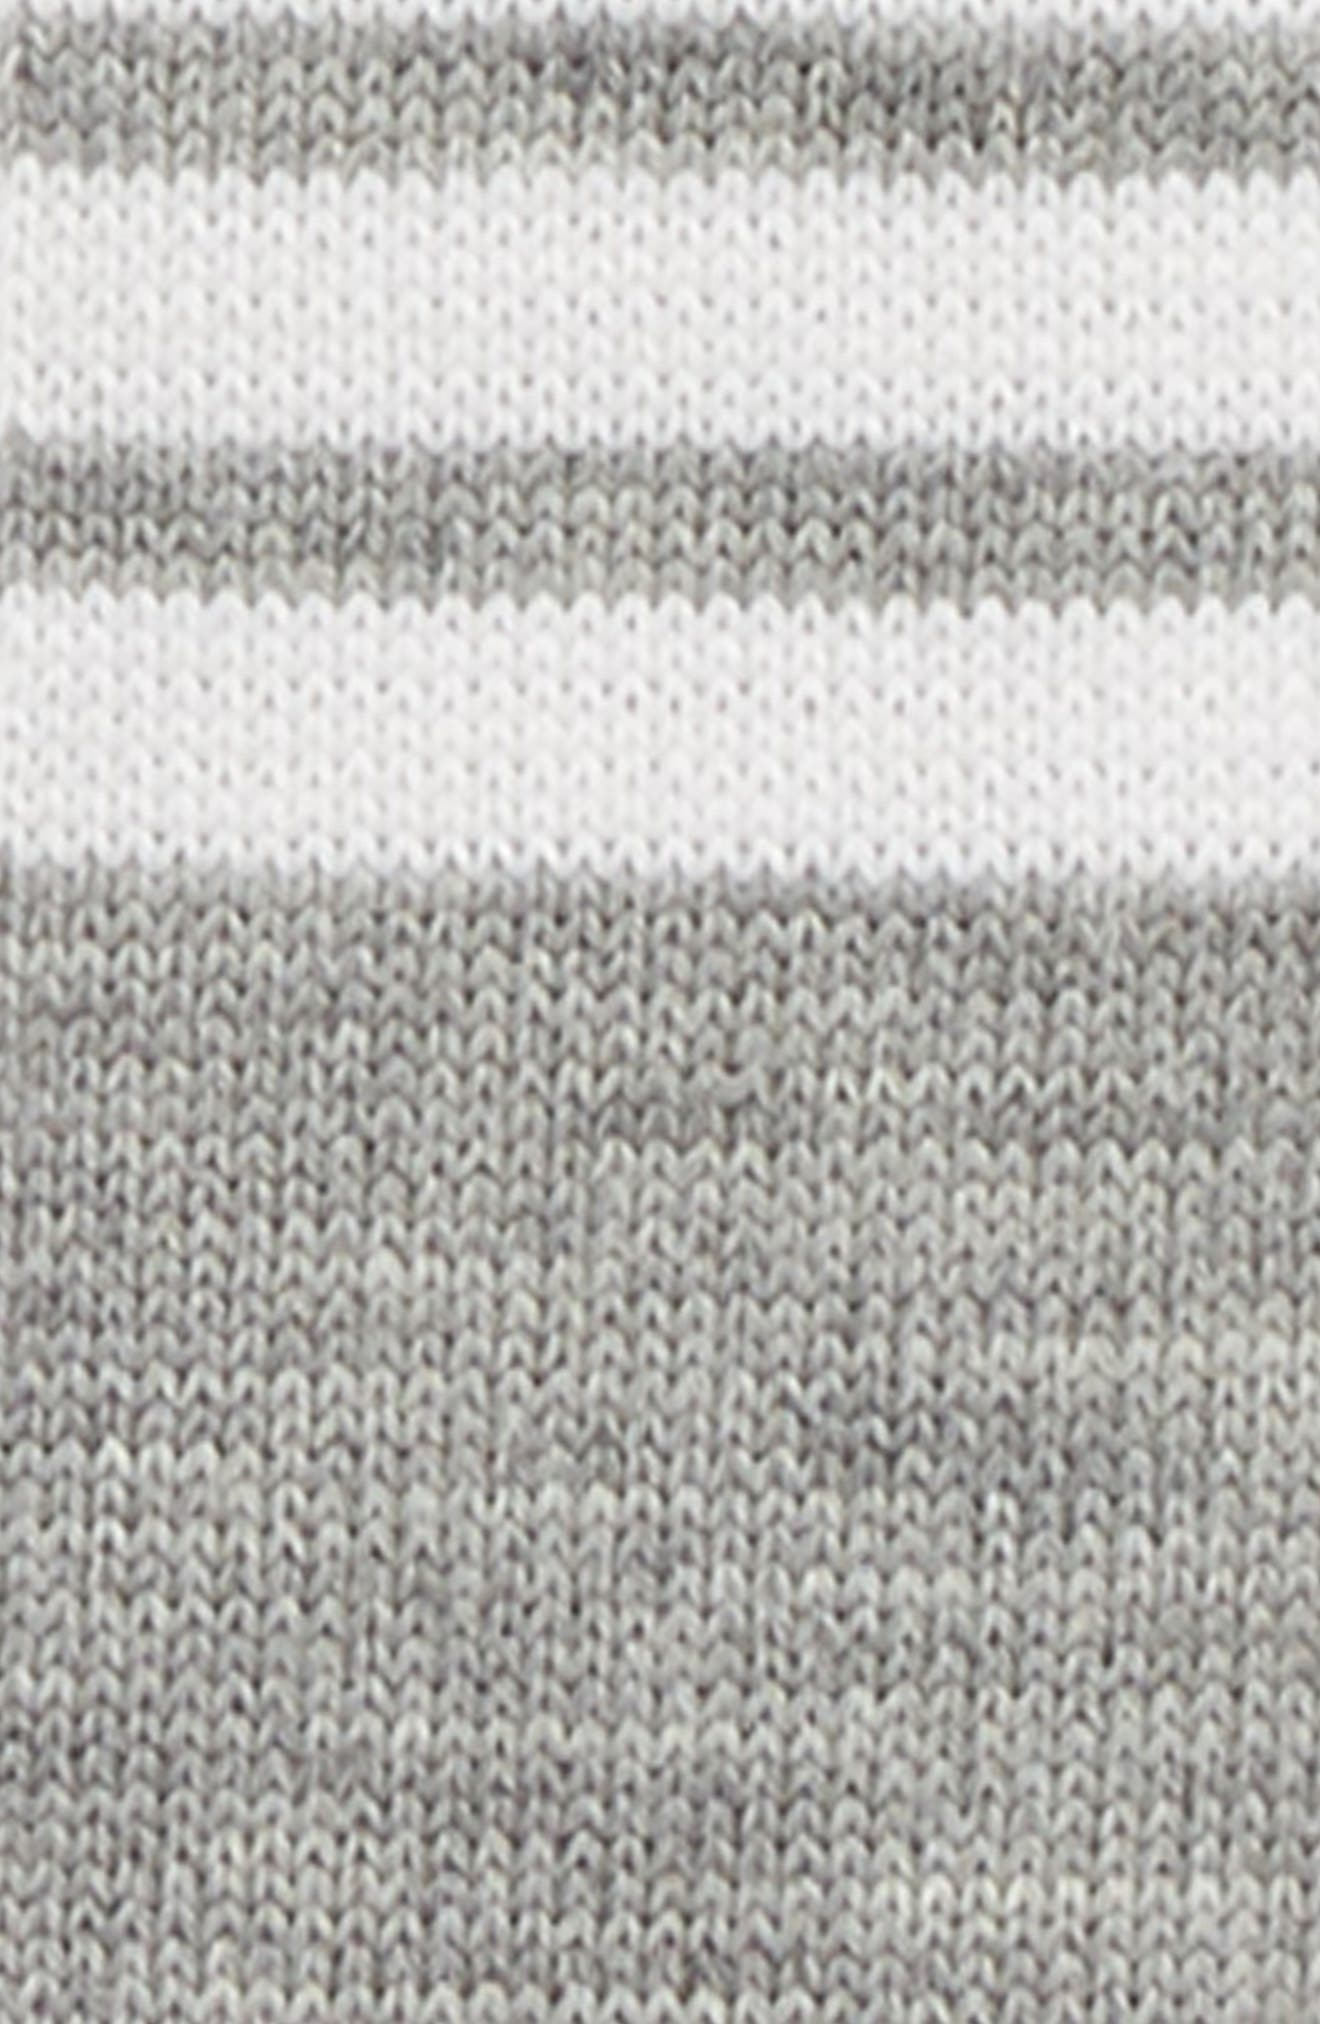 4-Bar Wool Knit Tie,                             Alternate thumbnail 2, color,                             035